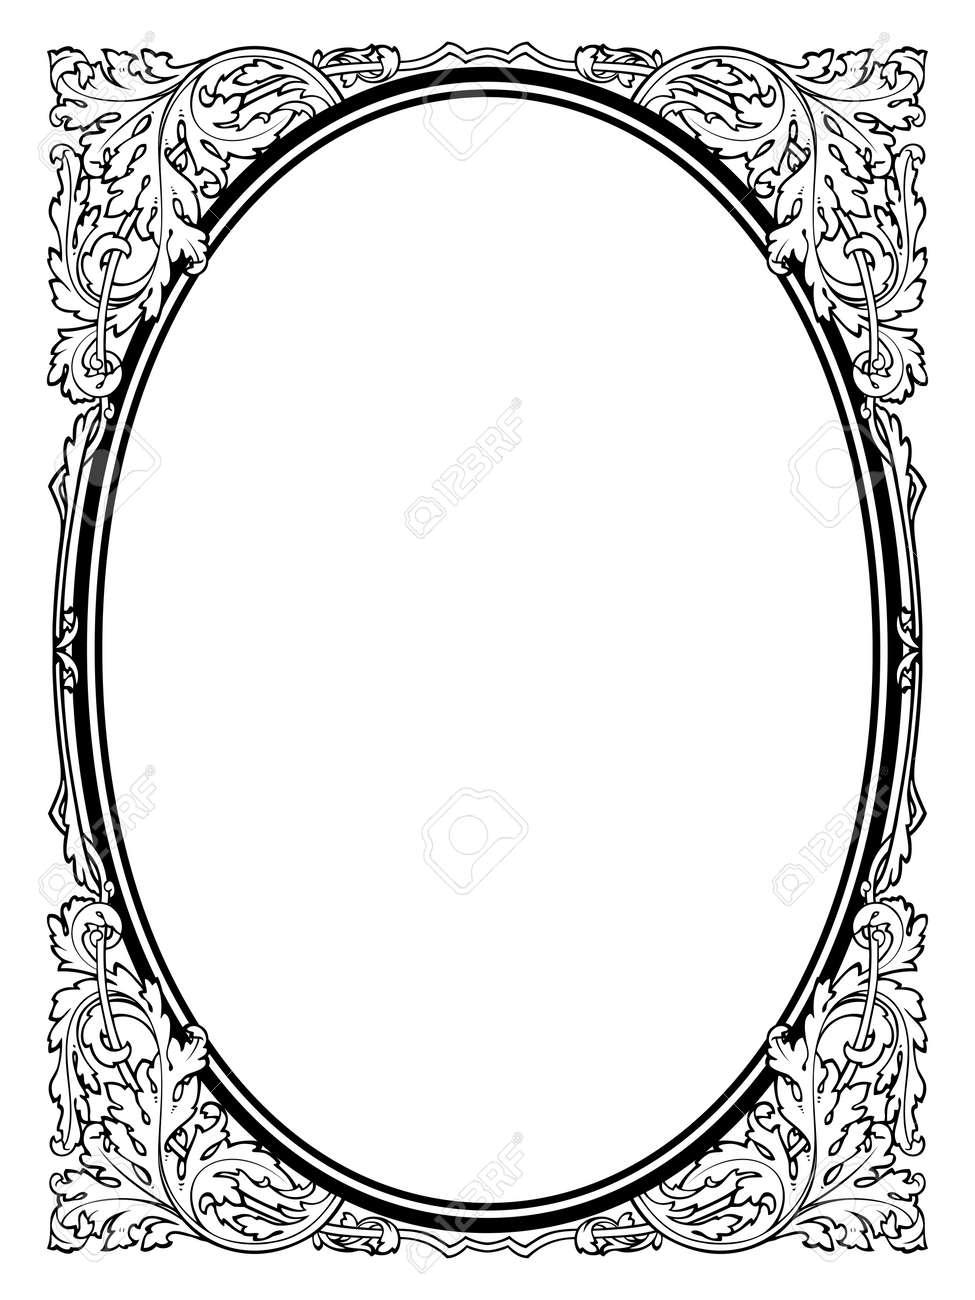 Calligraphie Calligraphie Cadre Baroque Ovale Noir Isolé Non